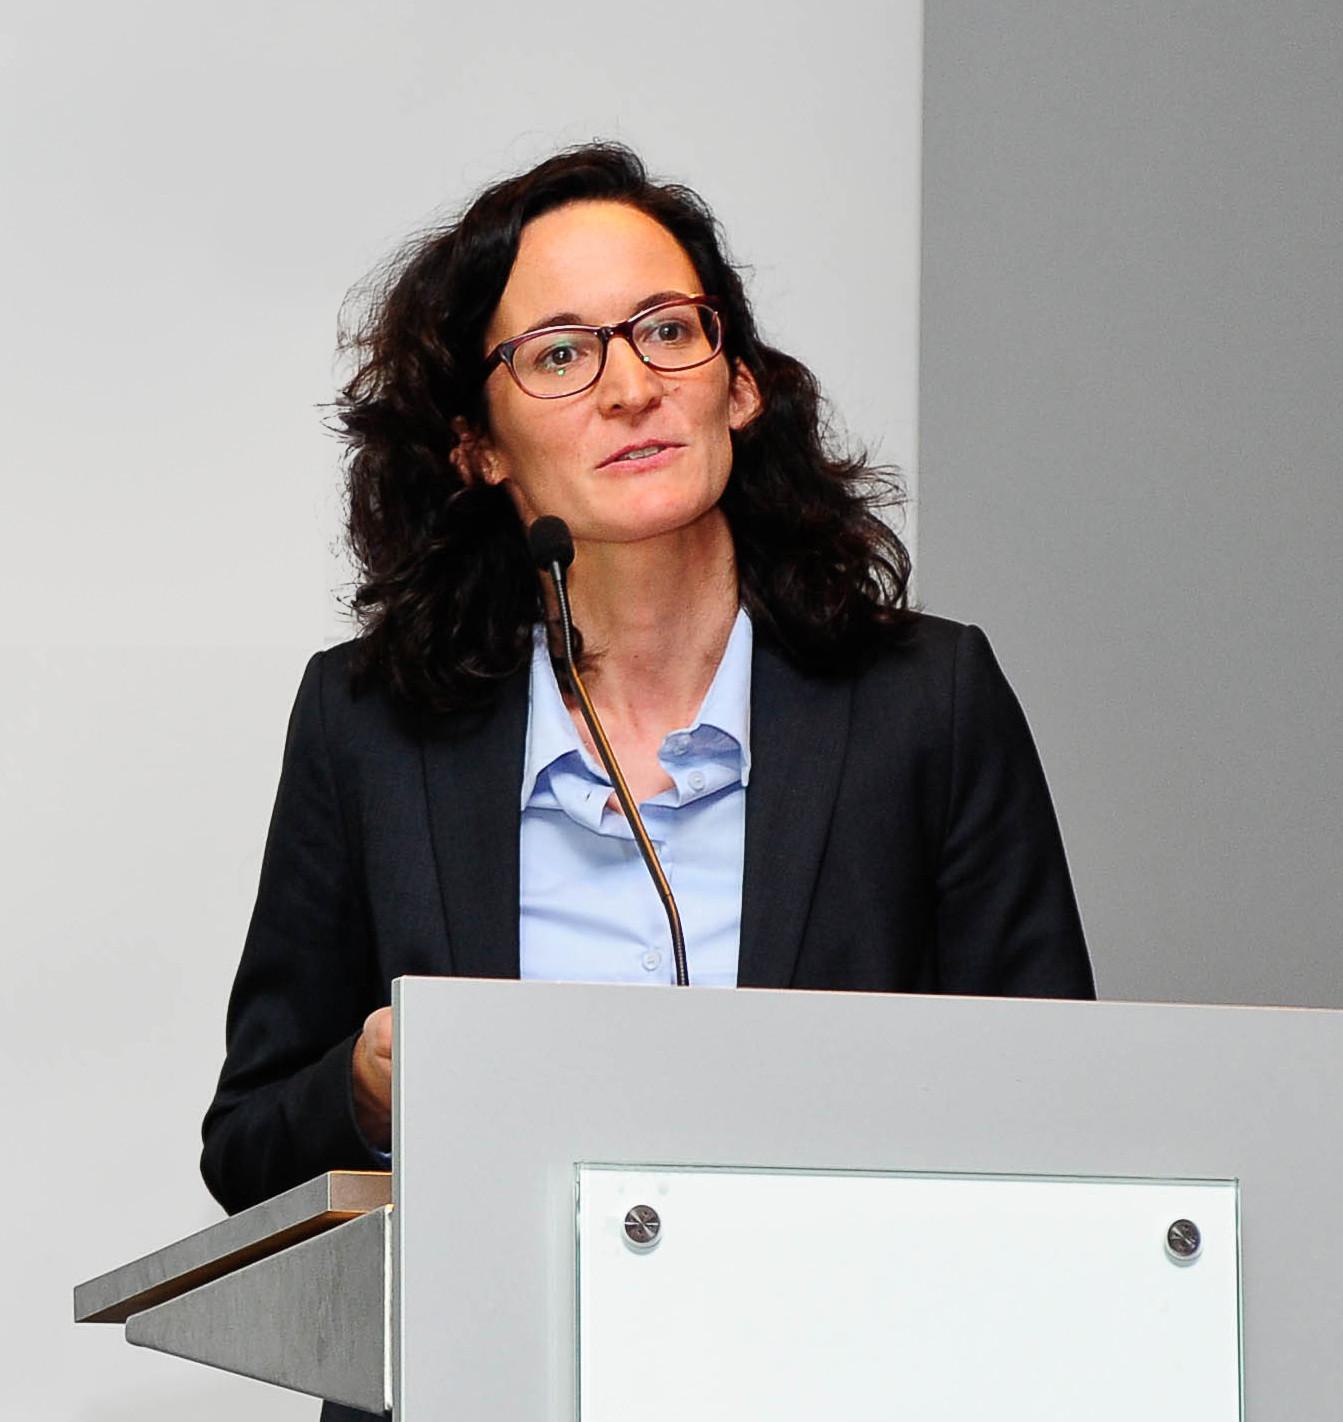 Werthmann named as new DOSB head of communications